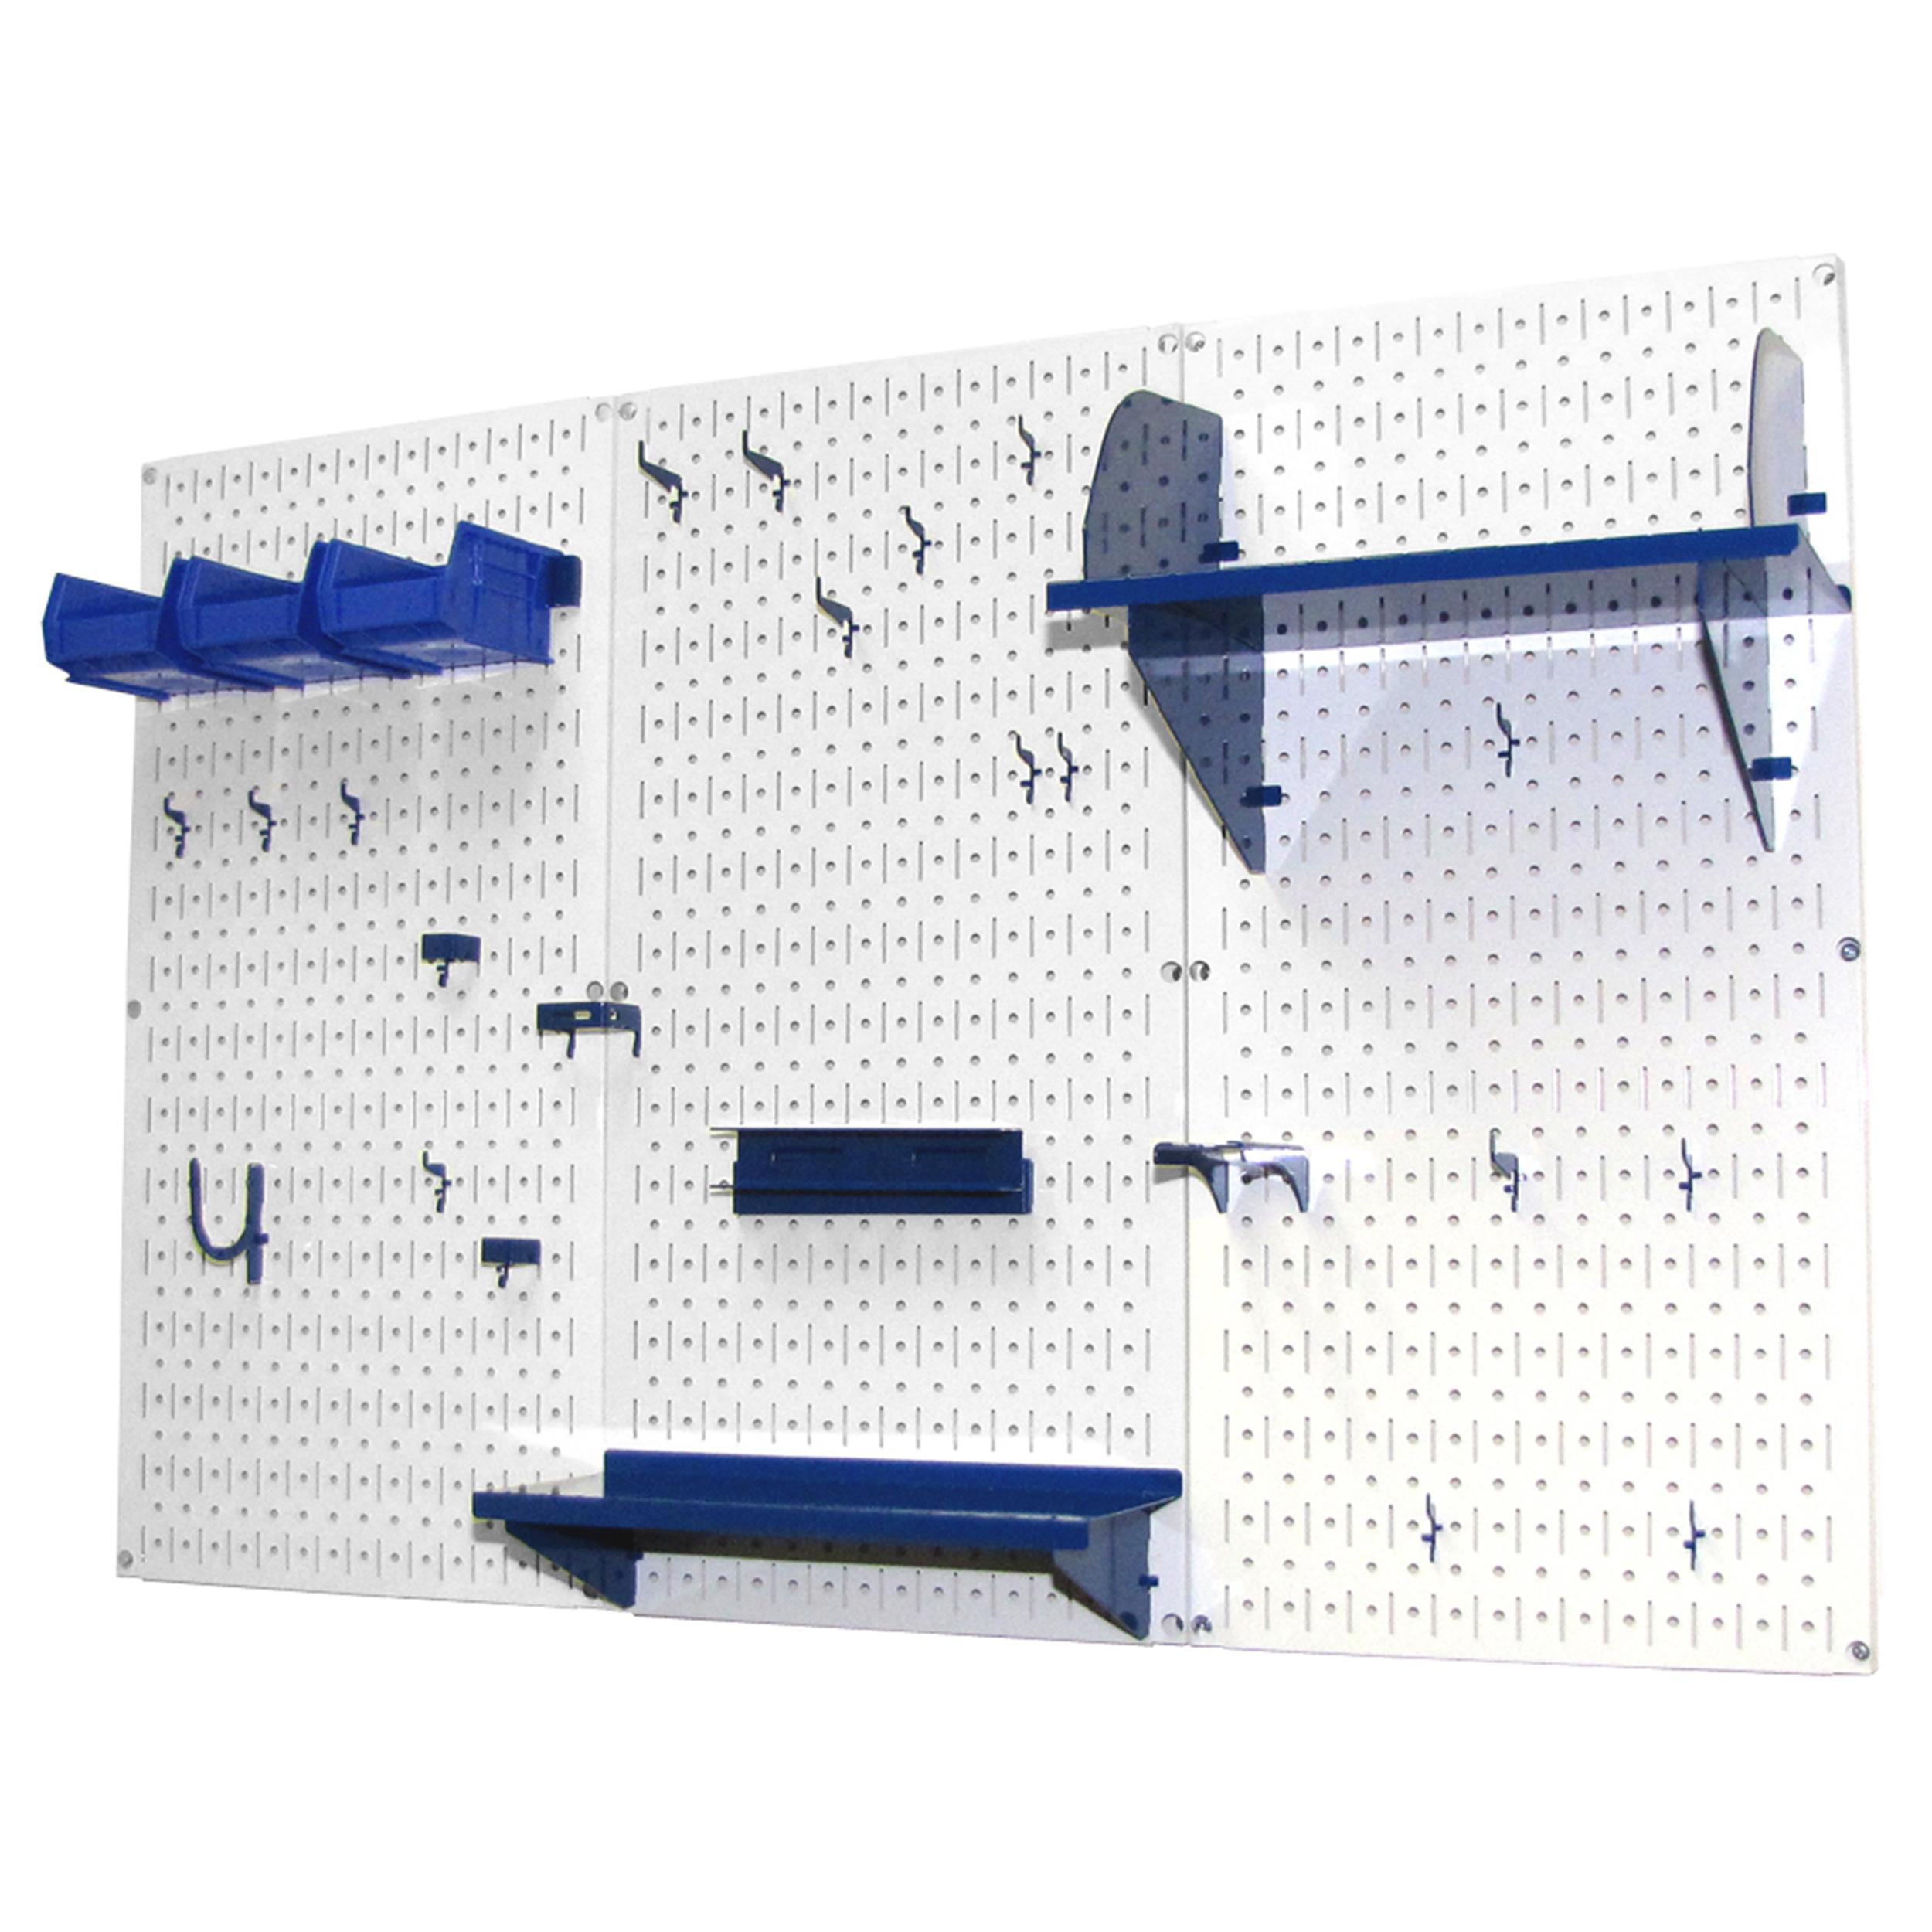 4' Metal Pegboard Standard Tool Storage Kit - White Toolboard & Blue Accessories